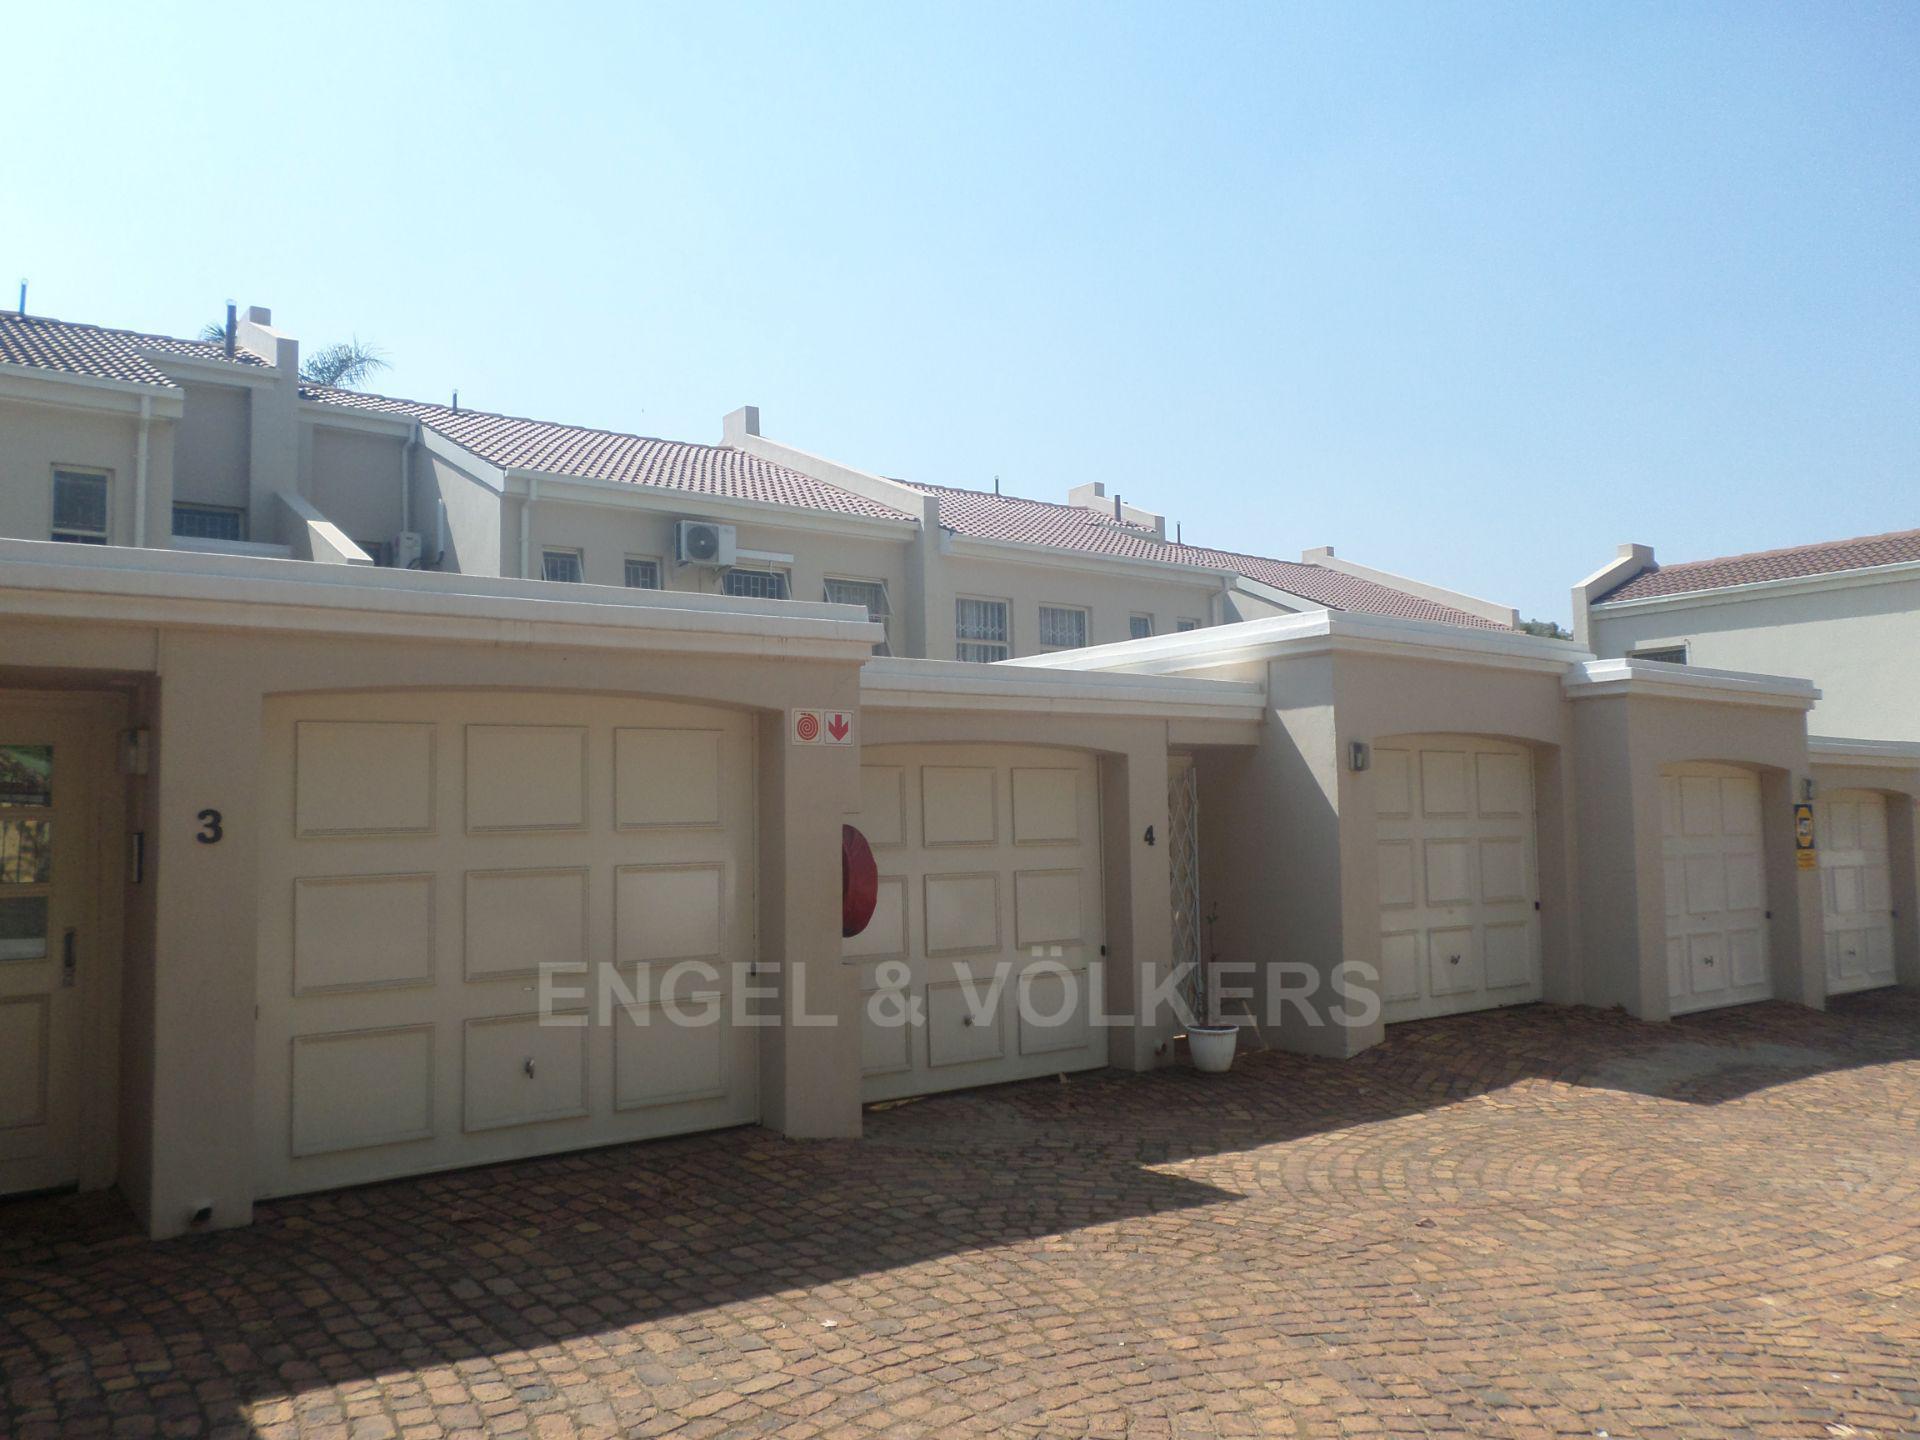 Pretoria, Hatfield Property  | Houses For Sale Hatfield, HATFIELD, Duplex 3 bedrooms property for sale Price:1,995,000